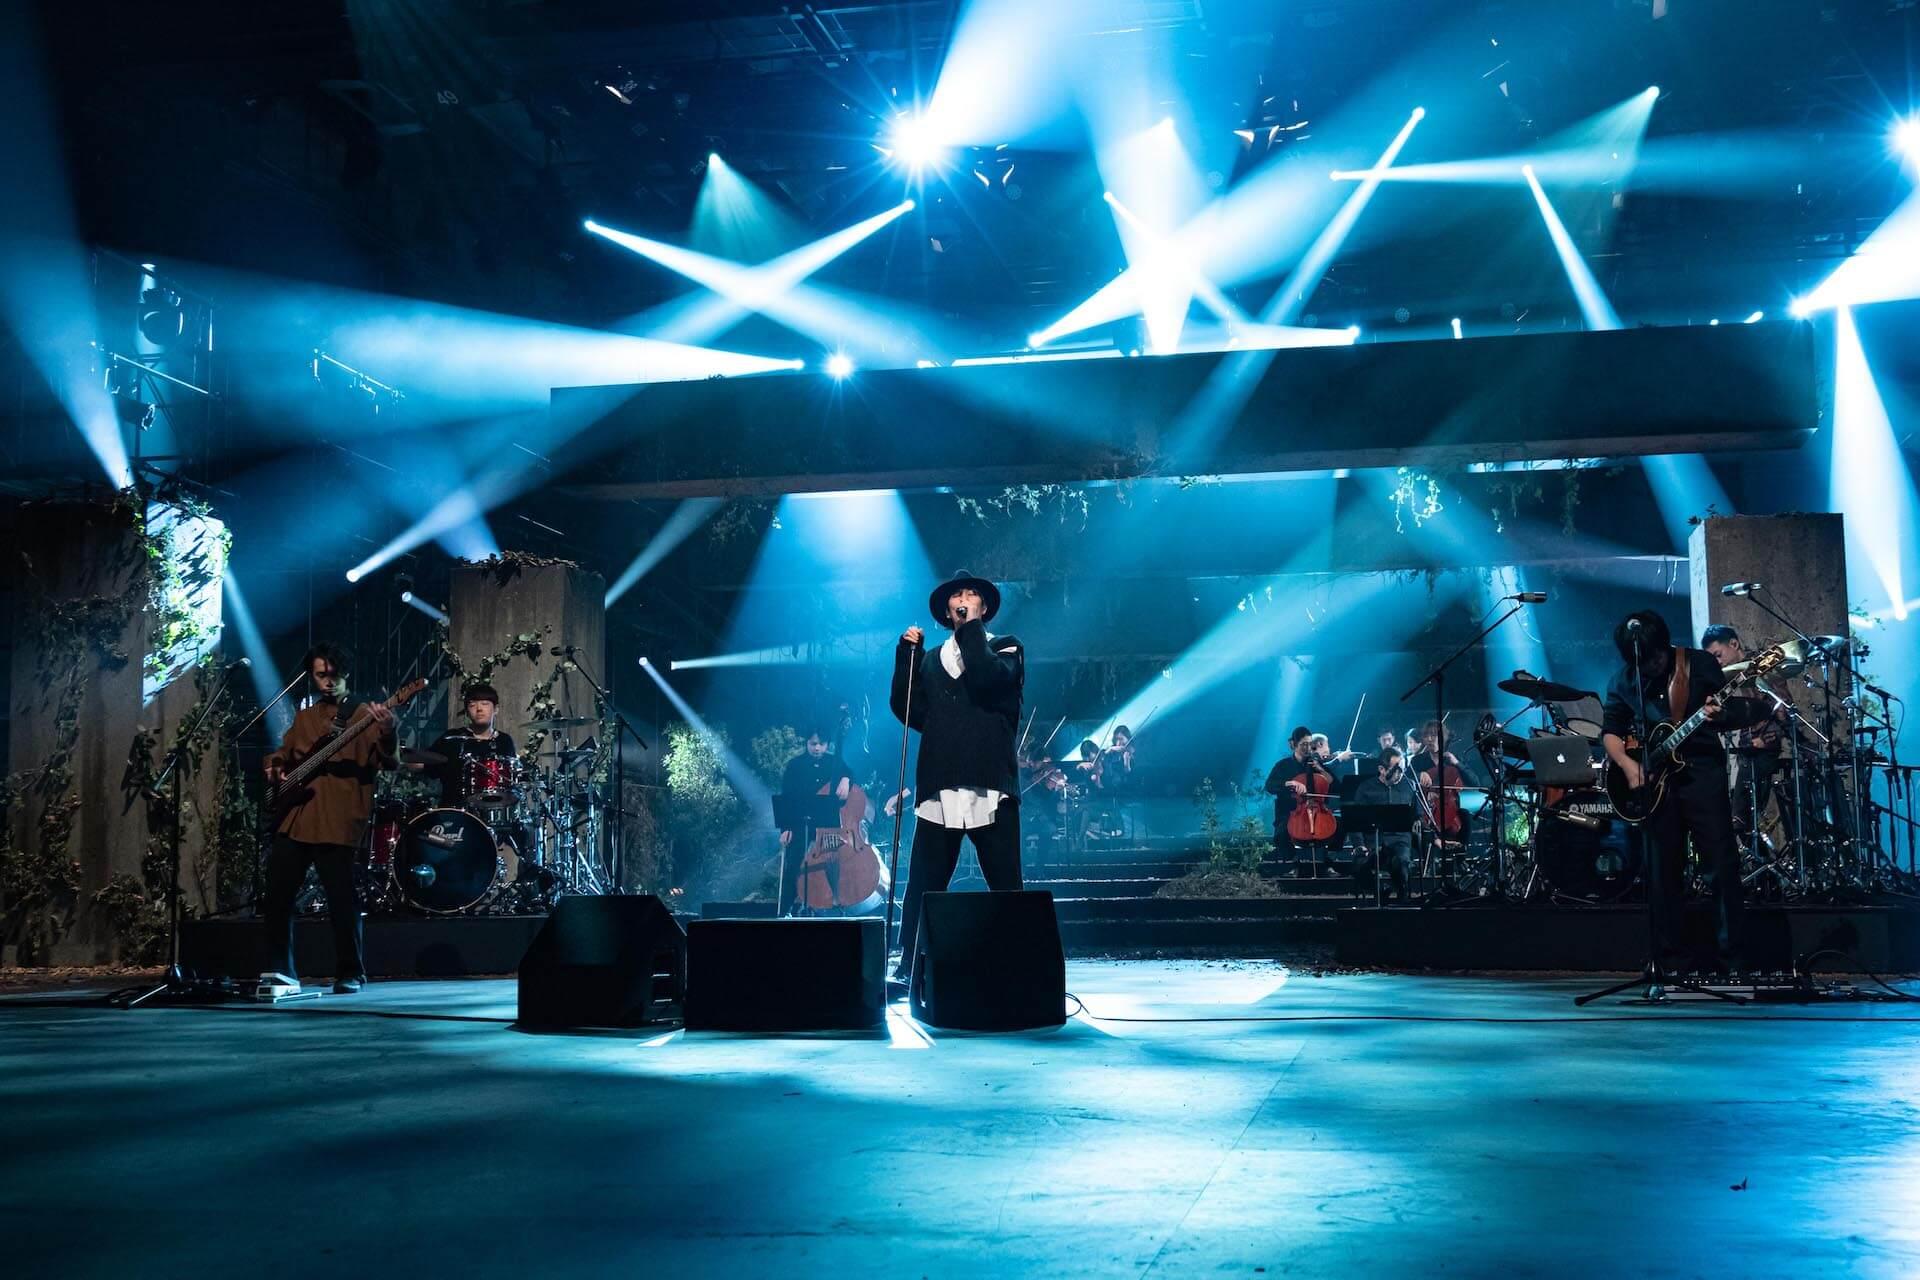 RADWIMPS、NHK総合にて「天気の子」特集番組の放送が決定!4曲のパフォーマンスを披露 art191023_radwimps_nhk_2